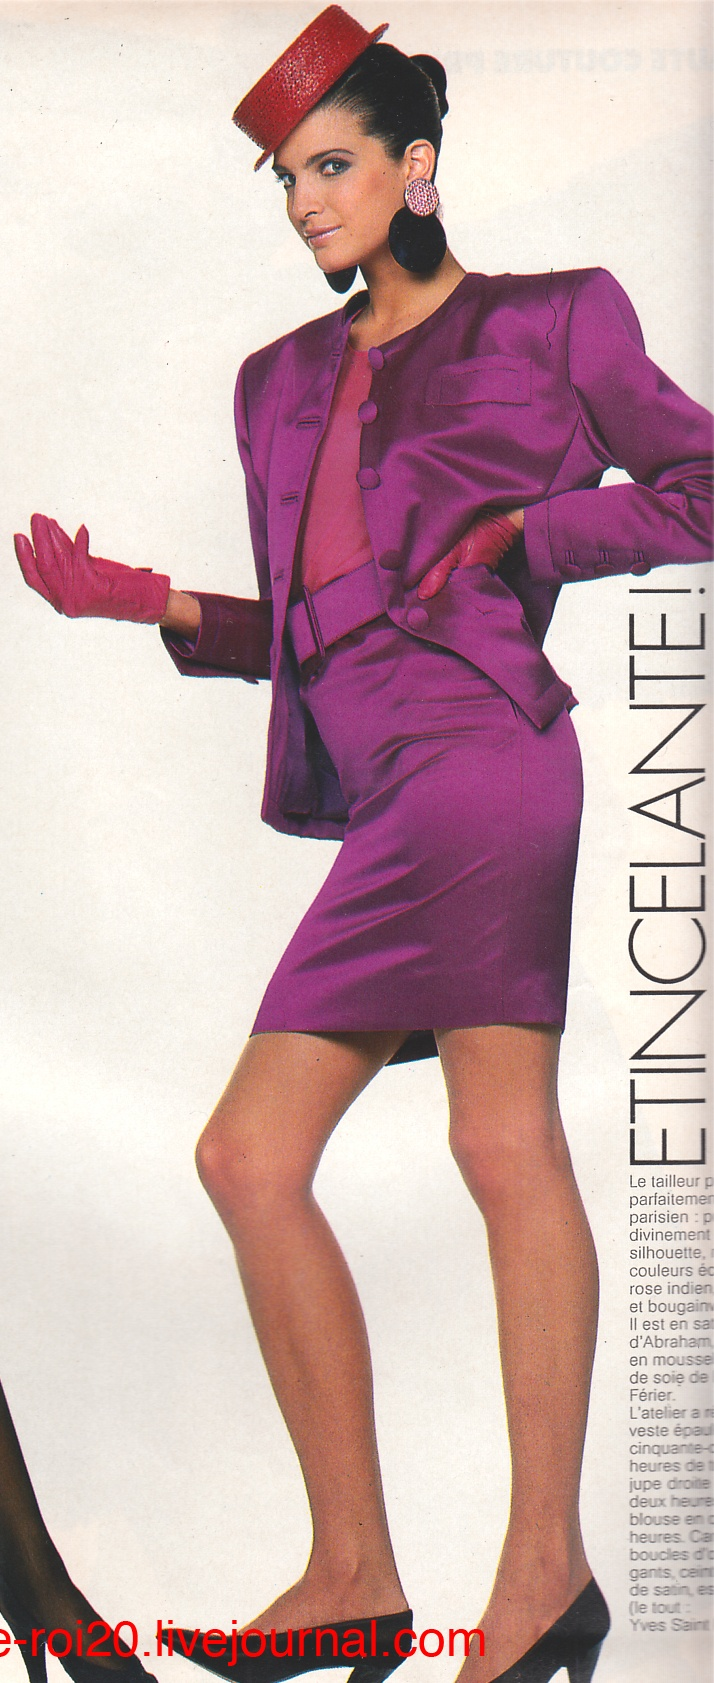 ☆ Stephanie Seymour | Photography by Marc Hispard | For Elle Magazine France | March 1987 ☆ #stephanieseymour #marchispard #elle #1987